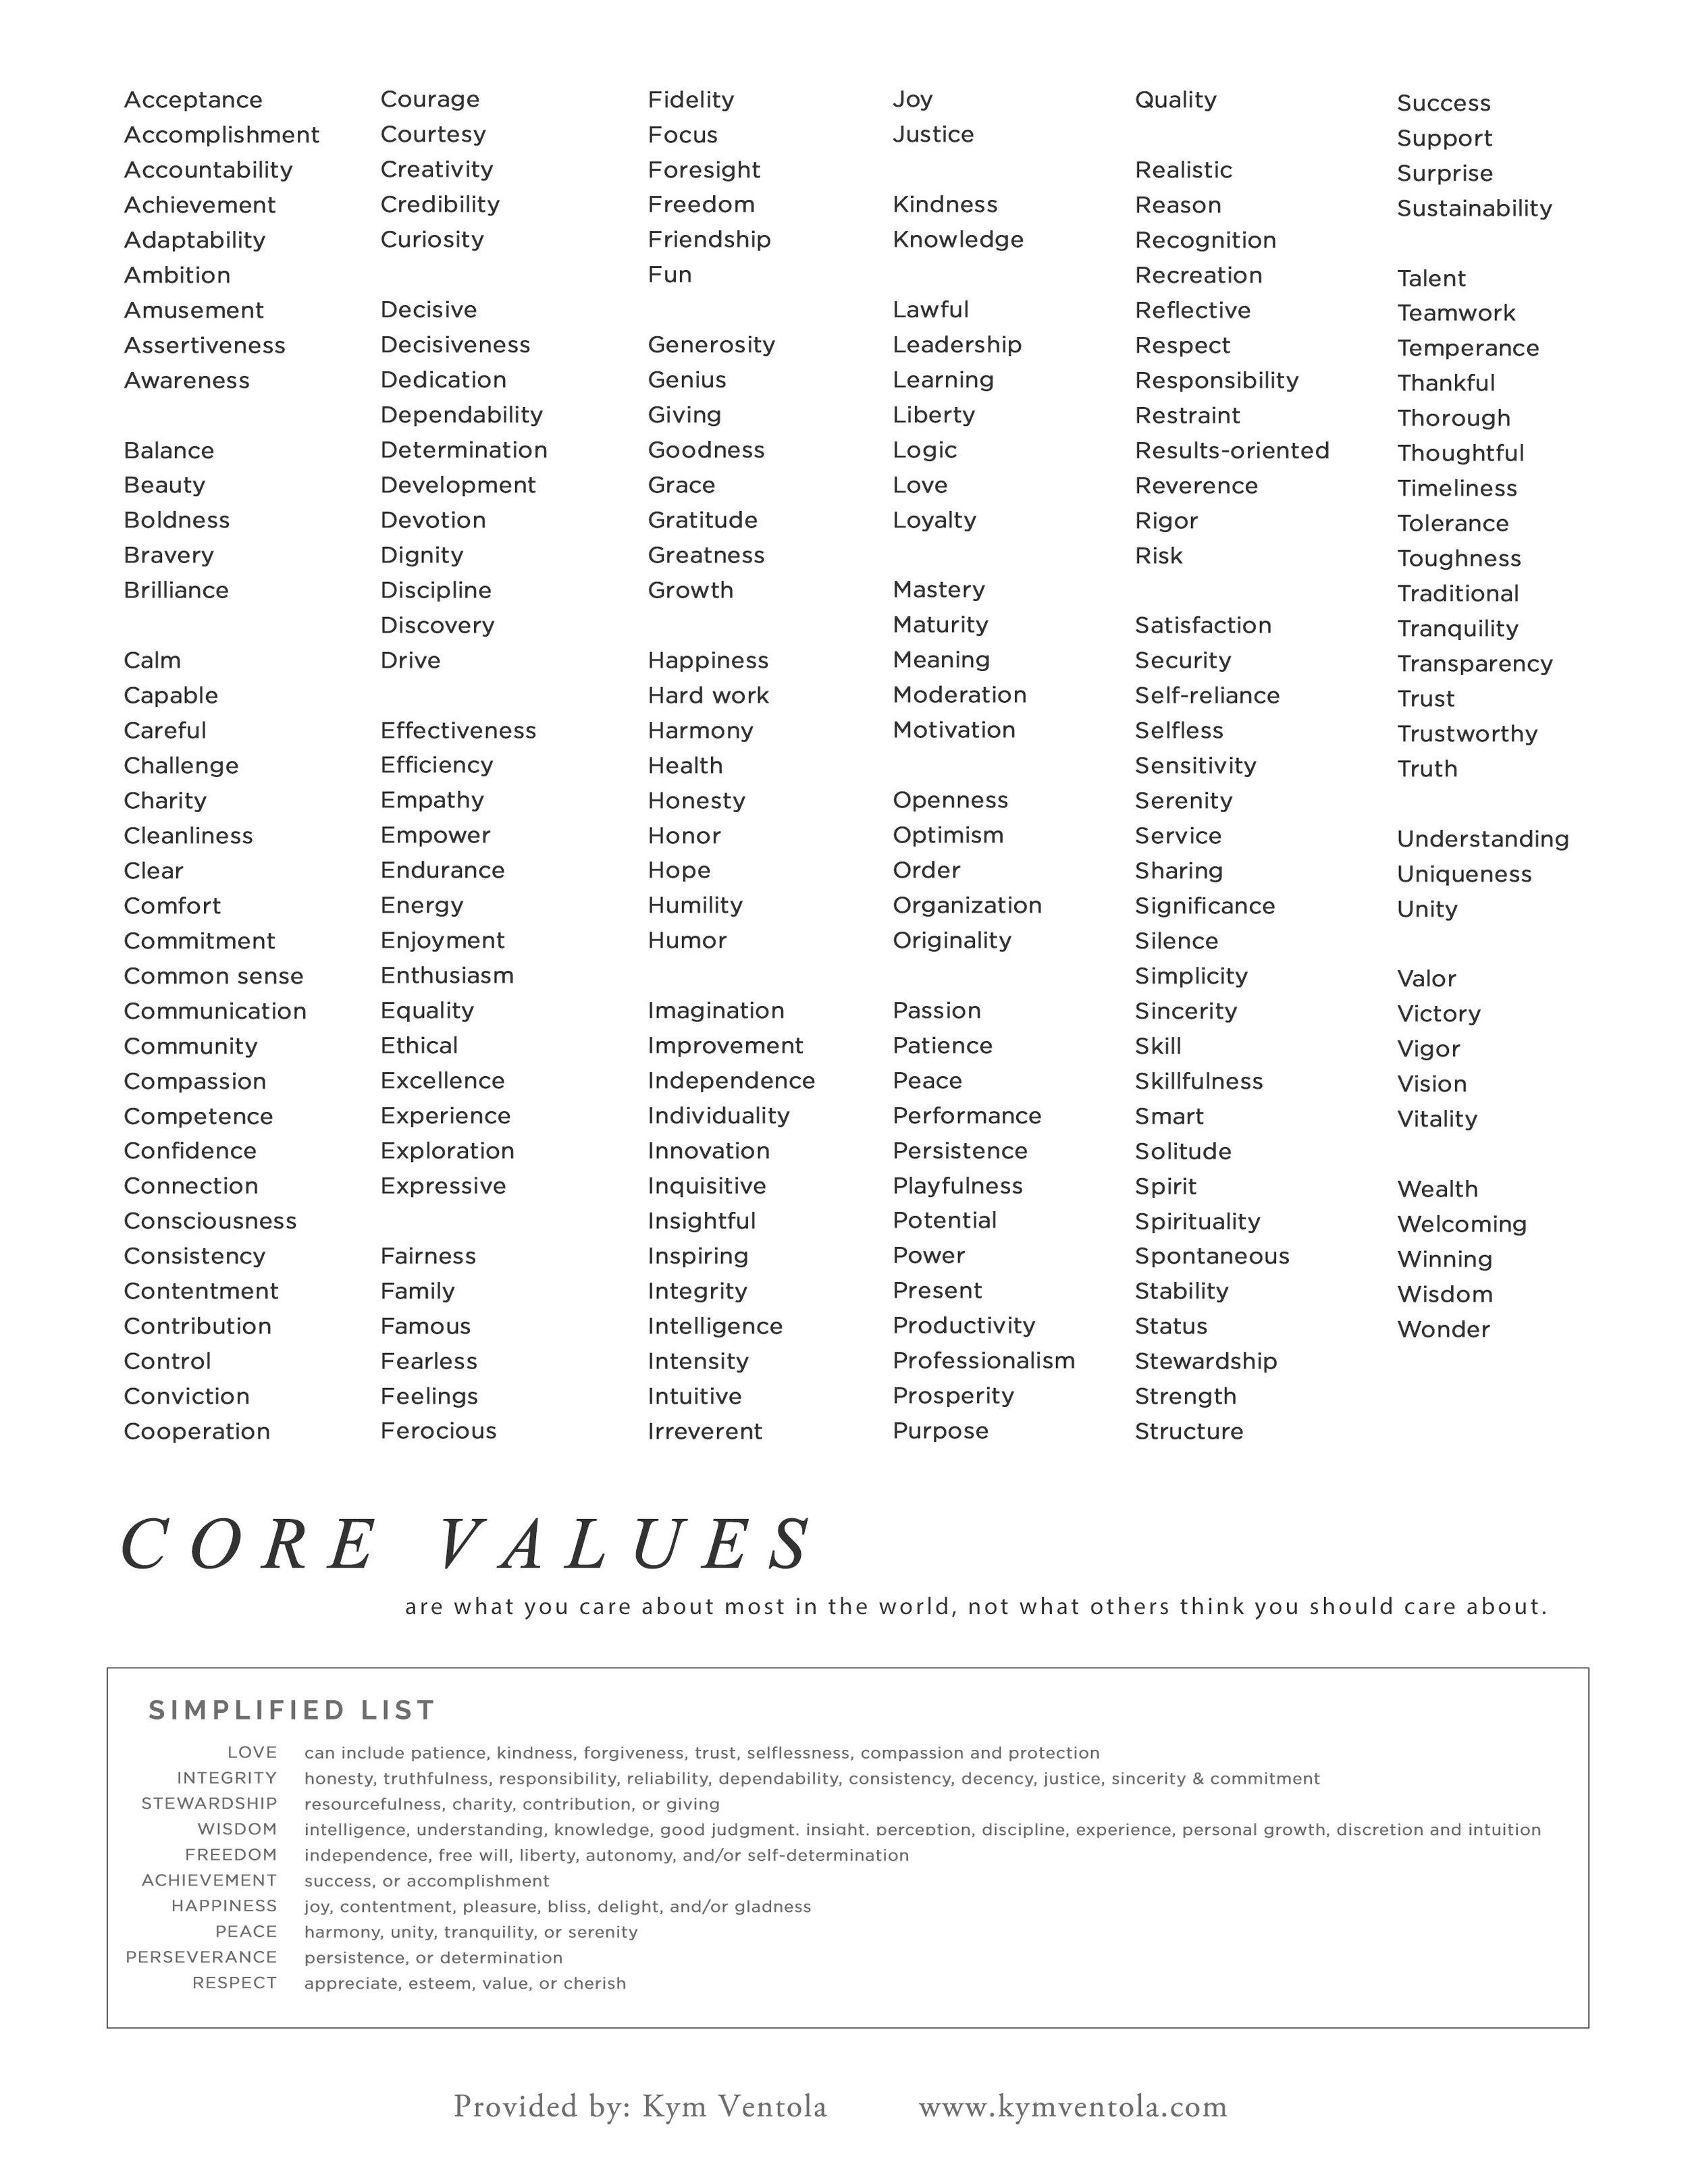 KymVentola Core Values Sheet.jpg